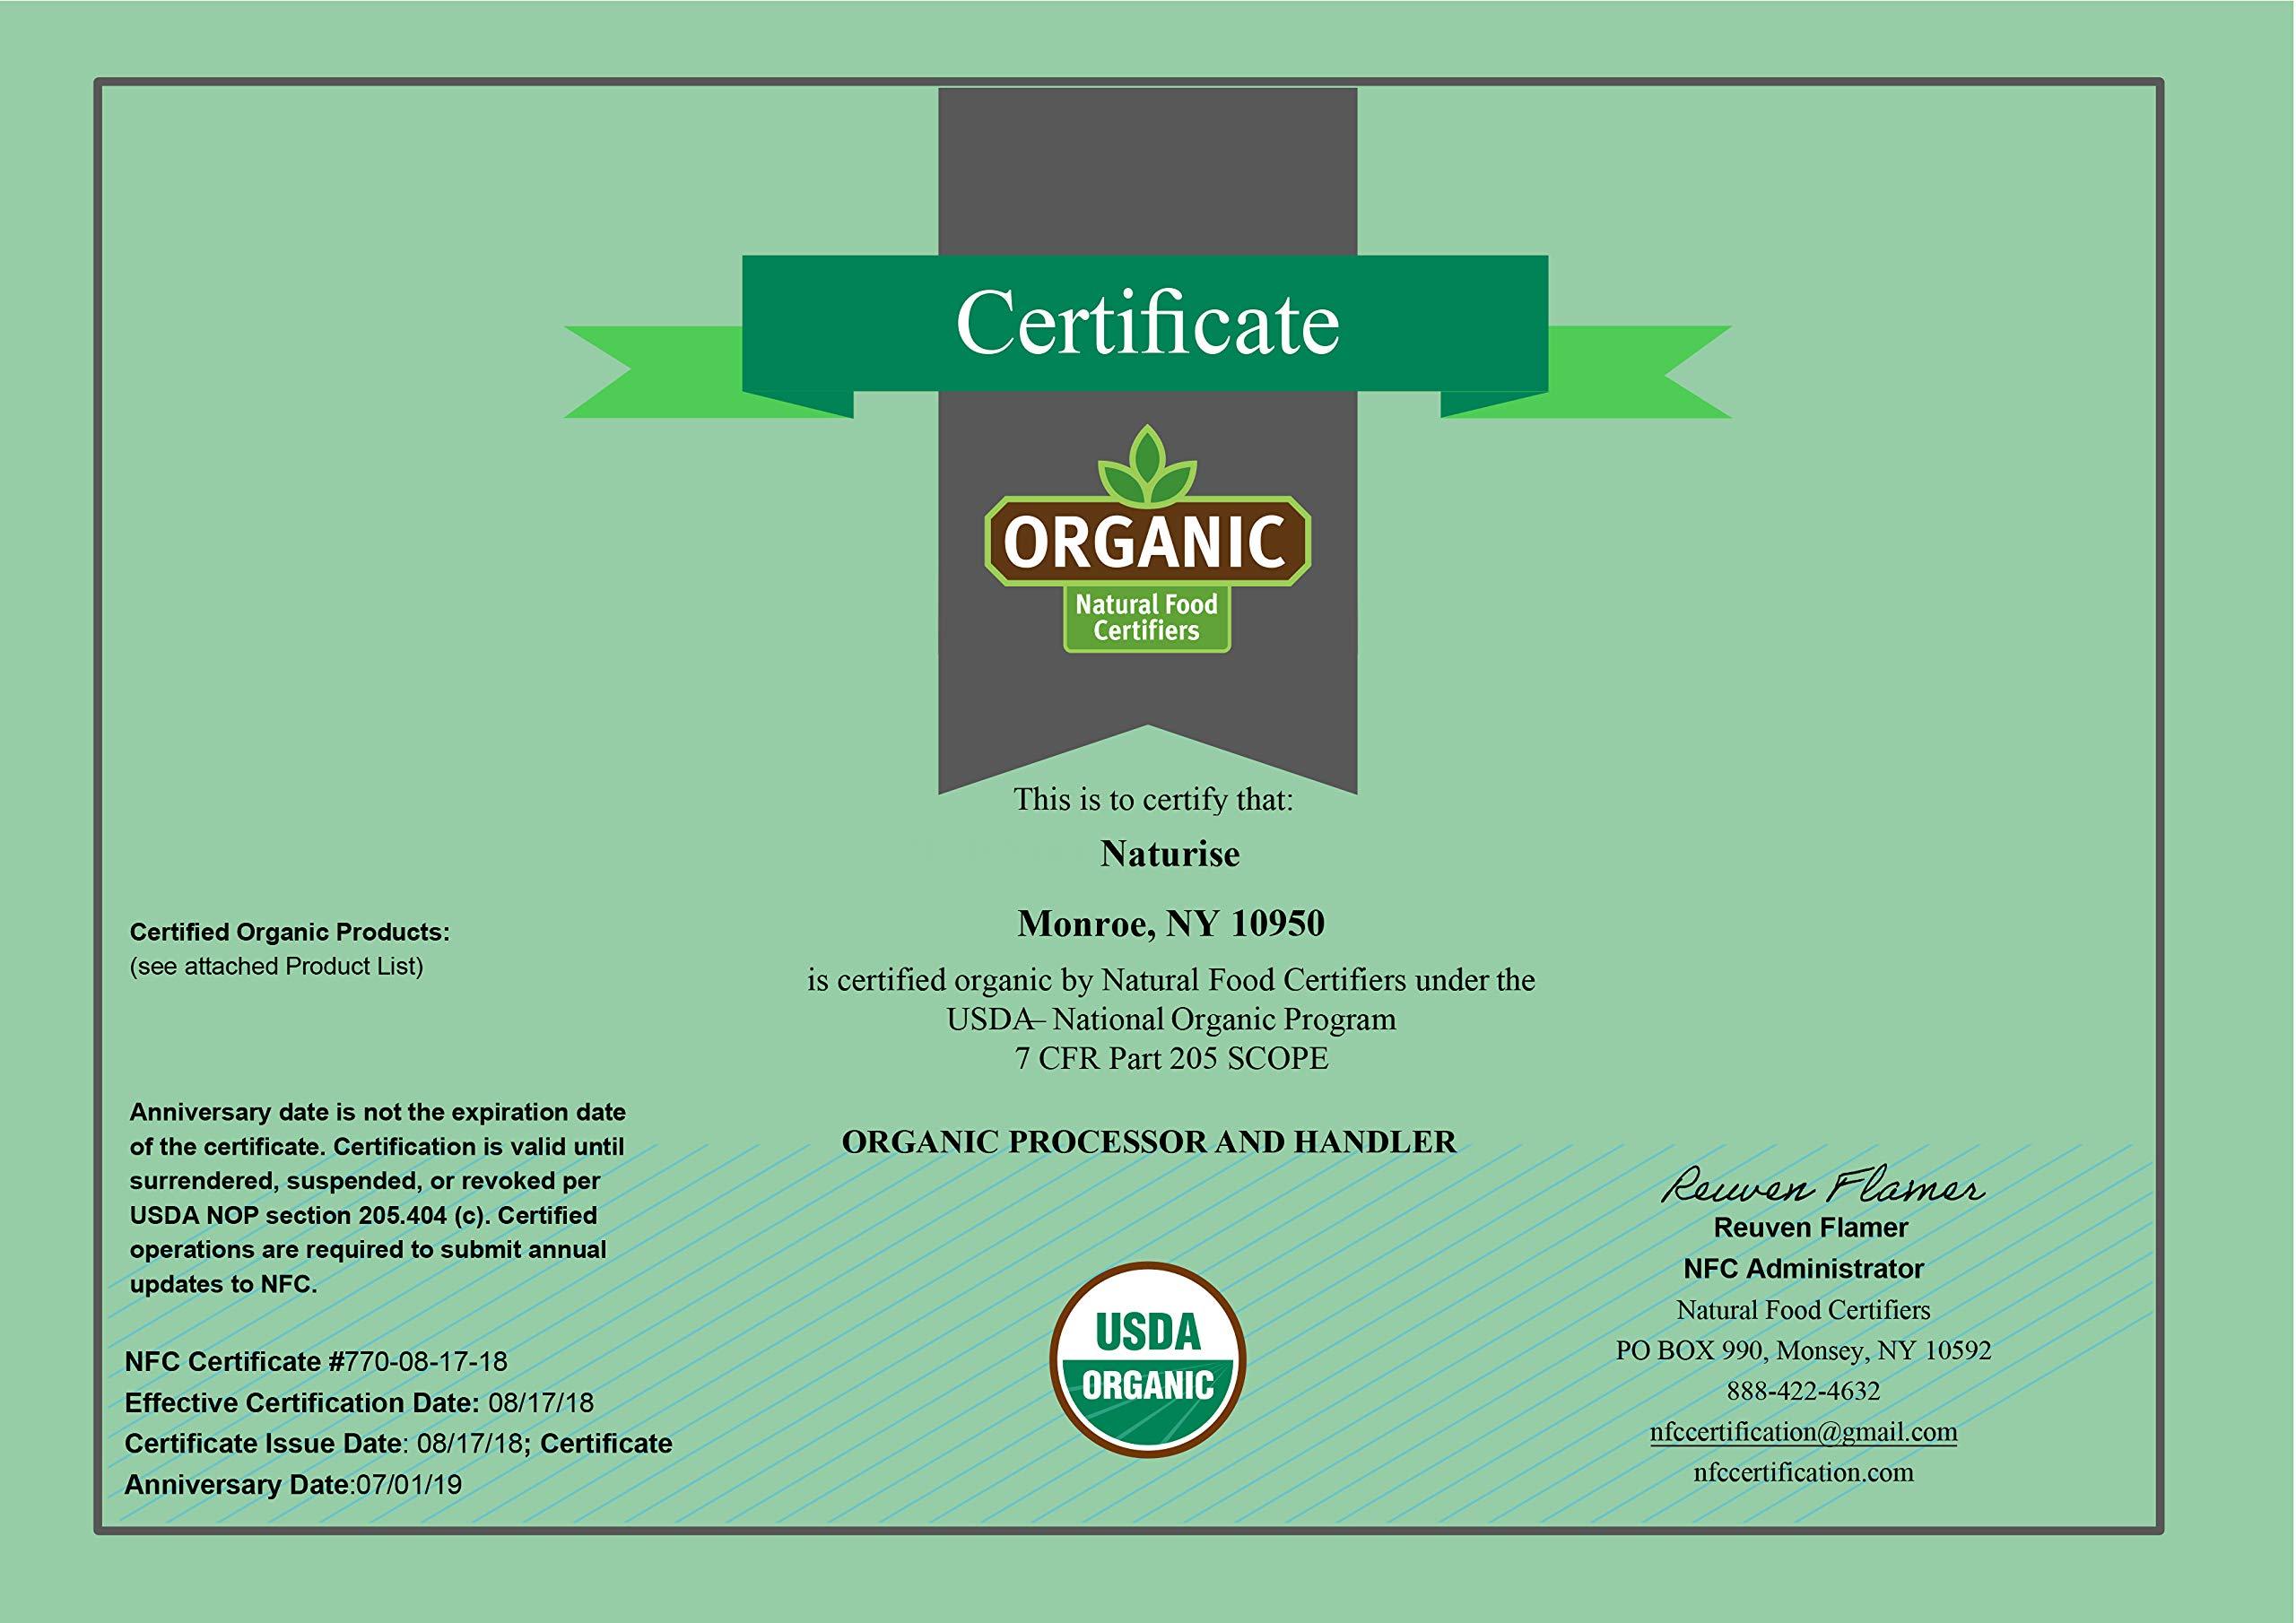 Naturise Black Seed Oil Organic Cold Pressed - Black Cumin Seed Oil,  Nigella Sativa - Source of Essential Fatty Acids, Omega 3 6 9, Super  Antioxidant